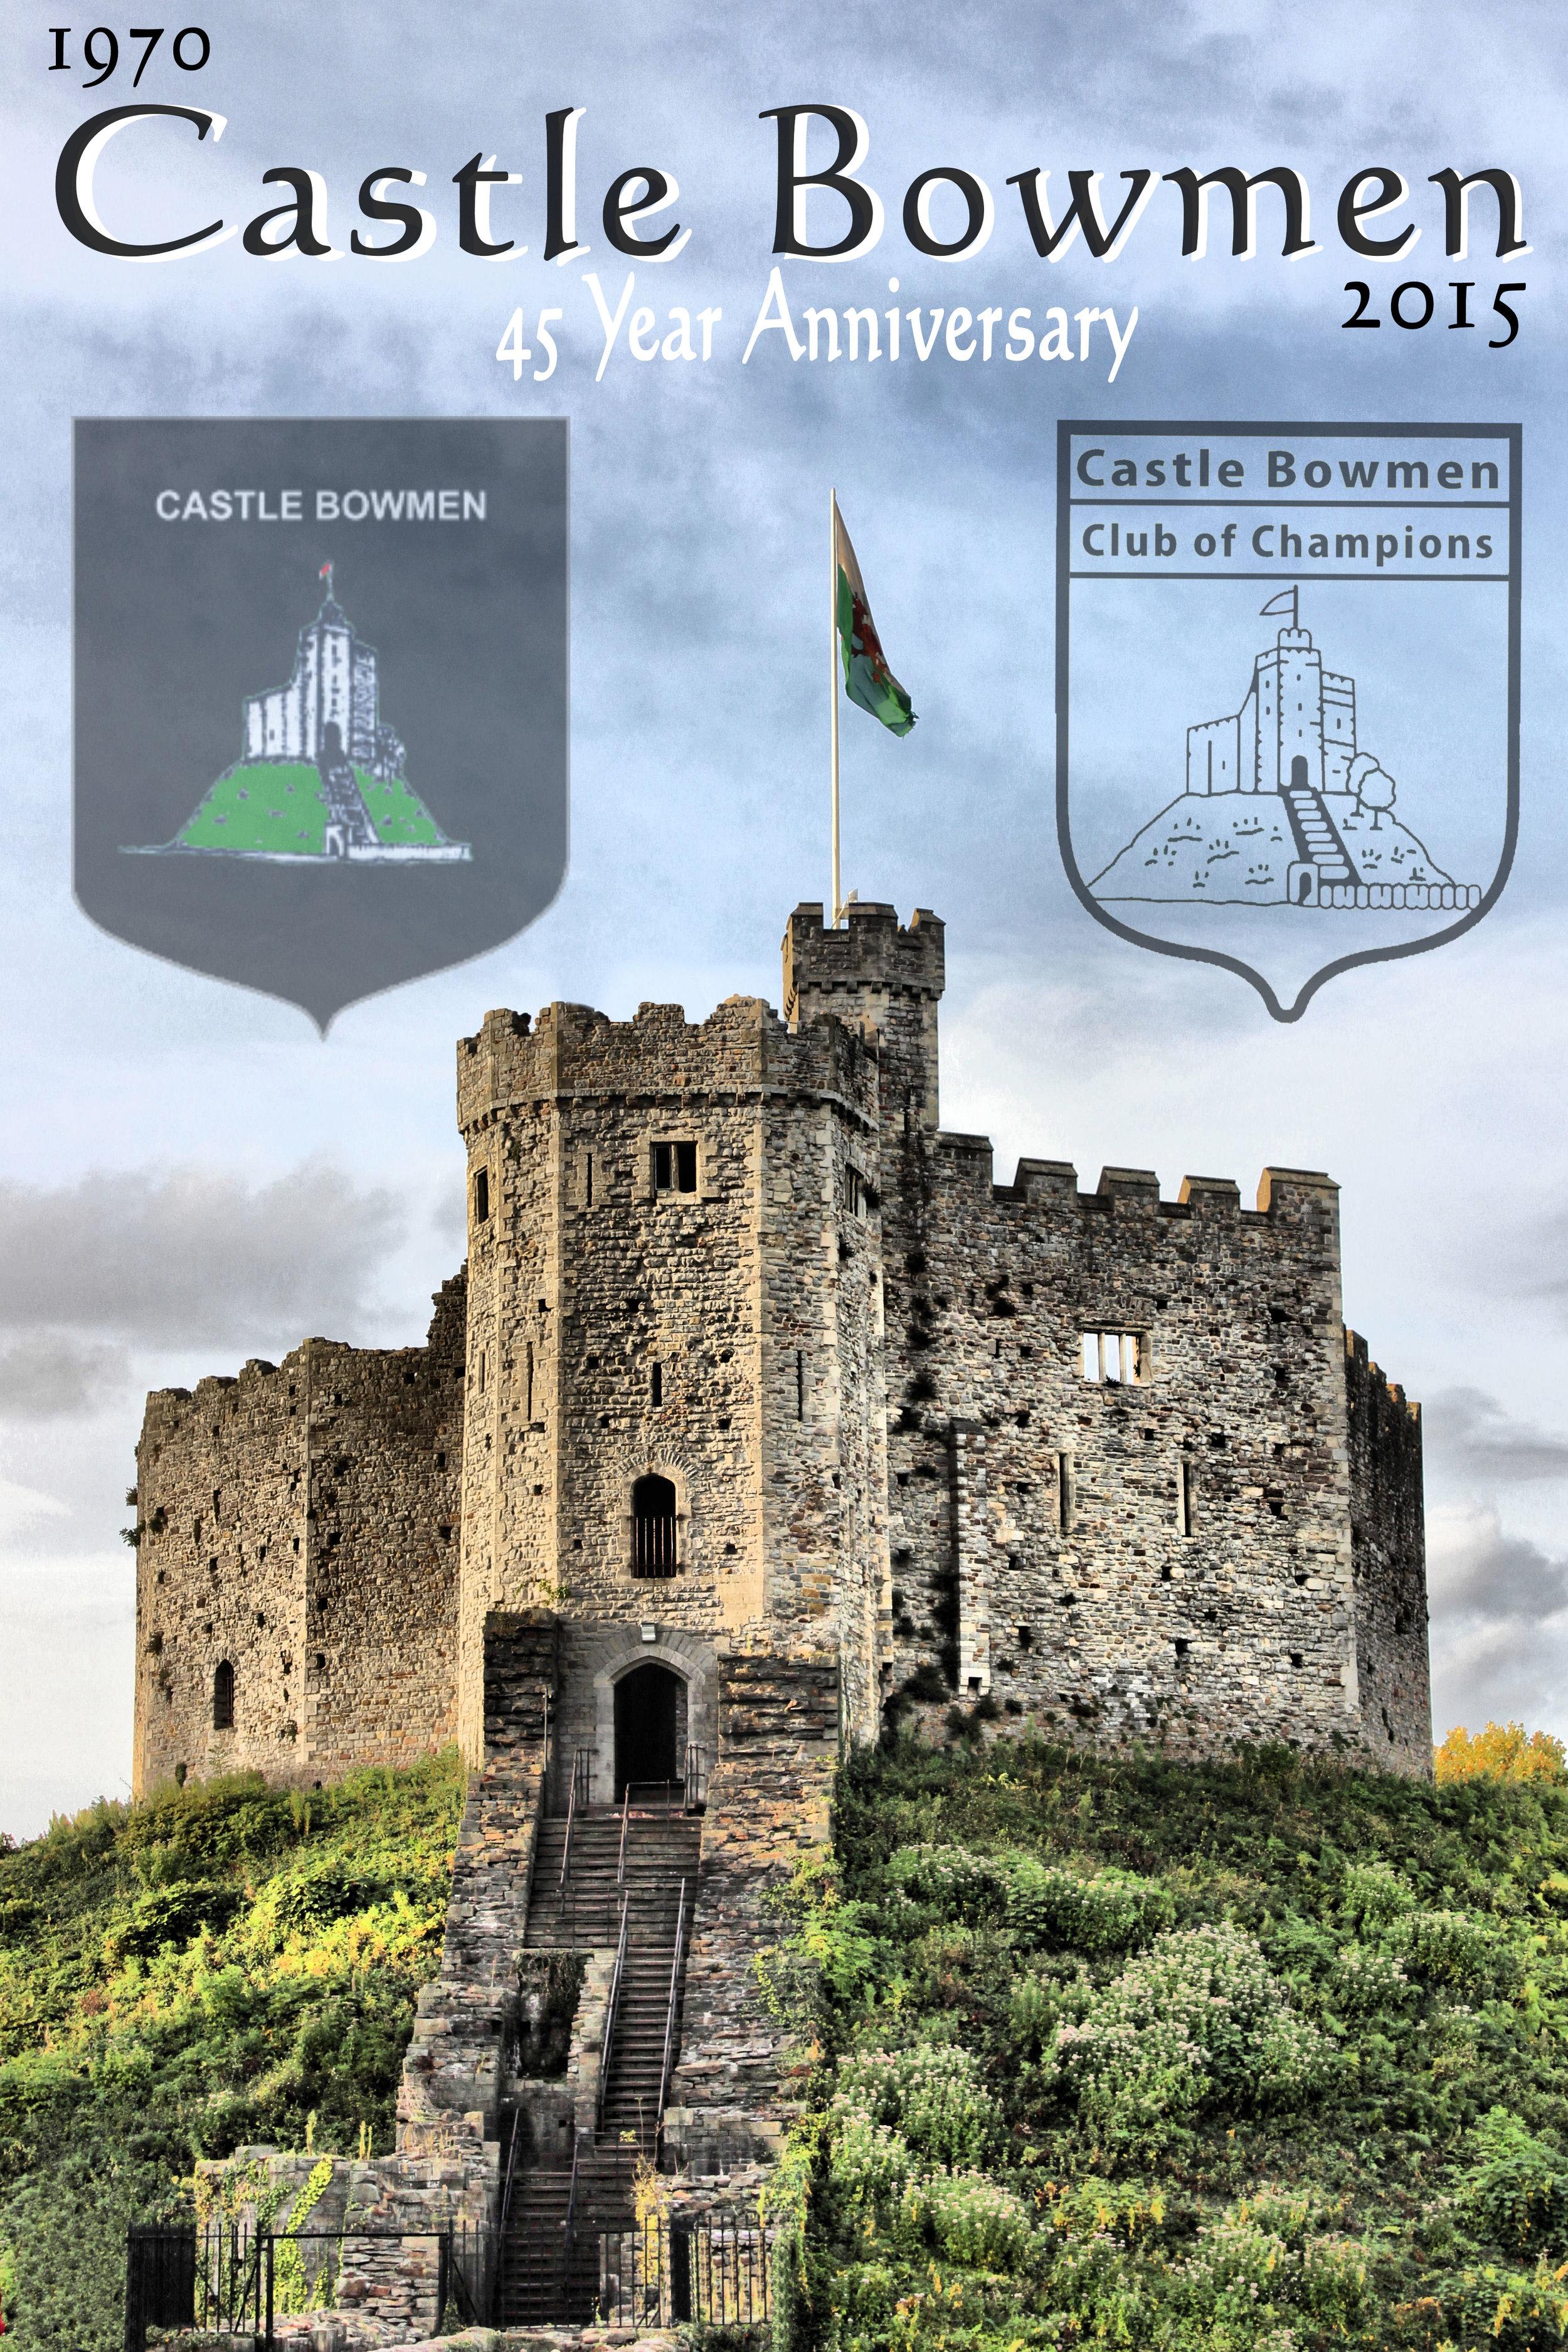 cardiff castle bowmen5.jpg